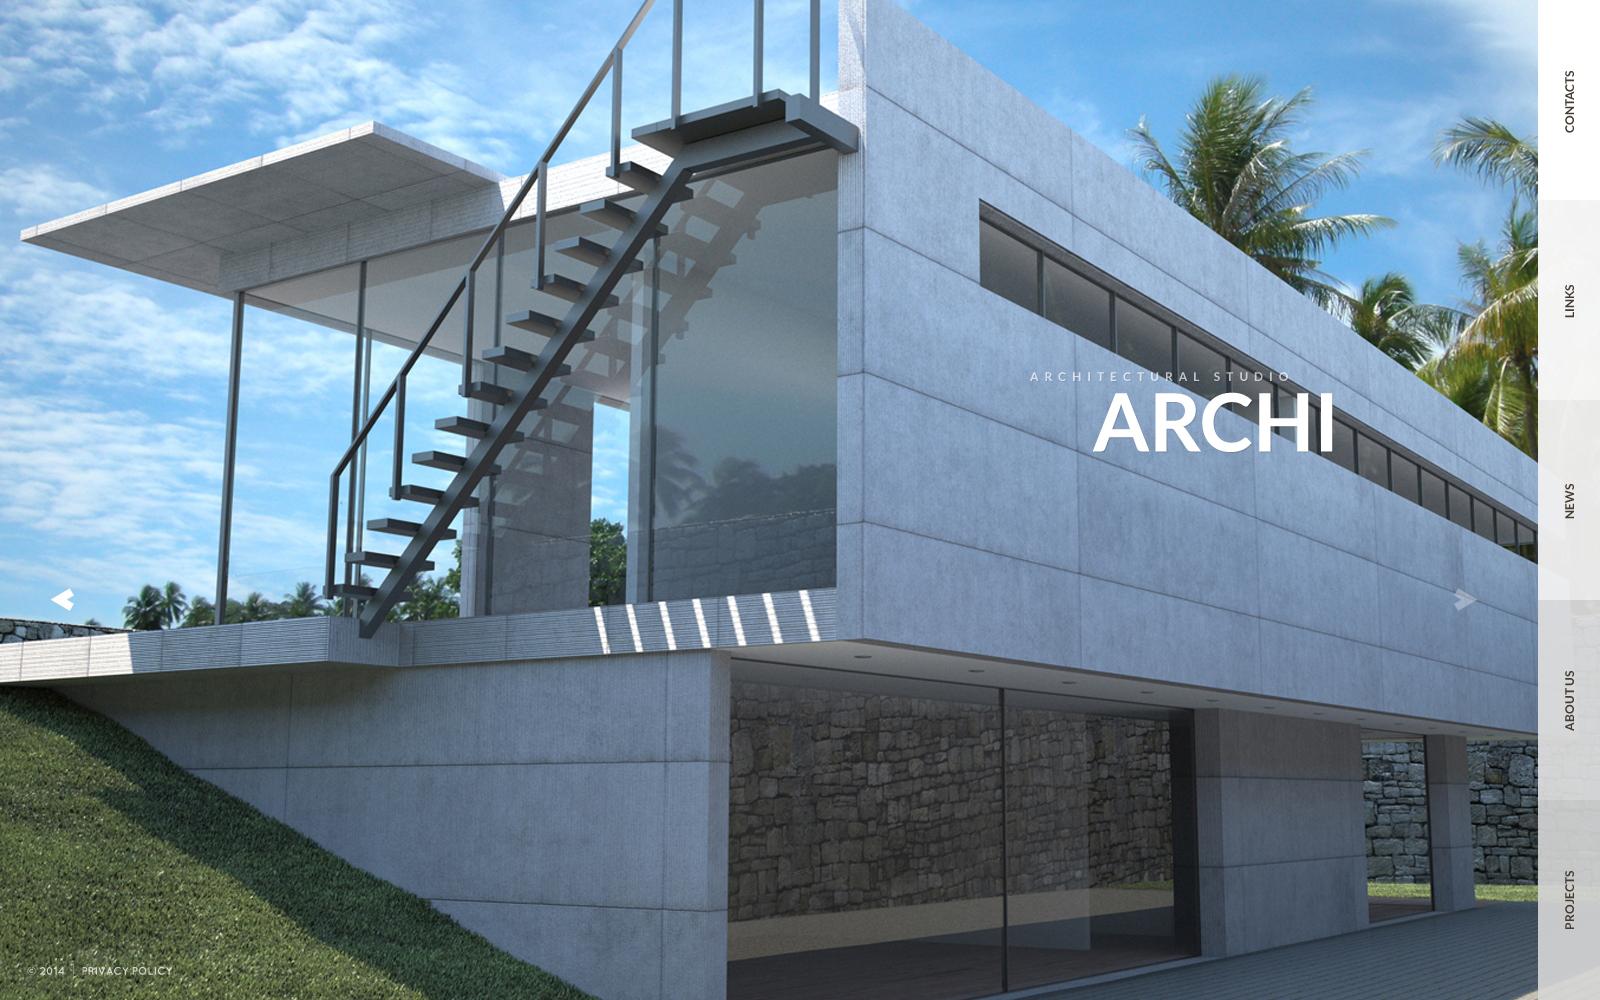 Bootstrap szablon strony www #50817 na temat: architektura